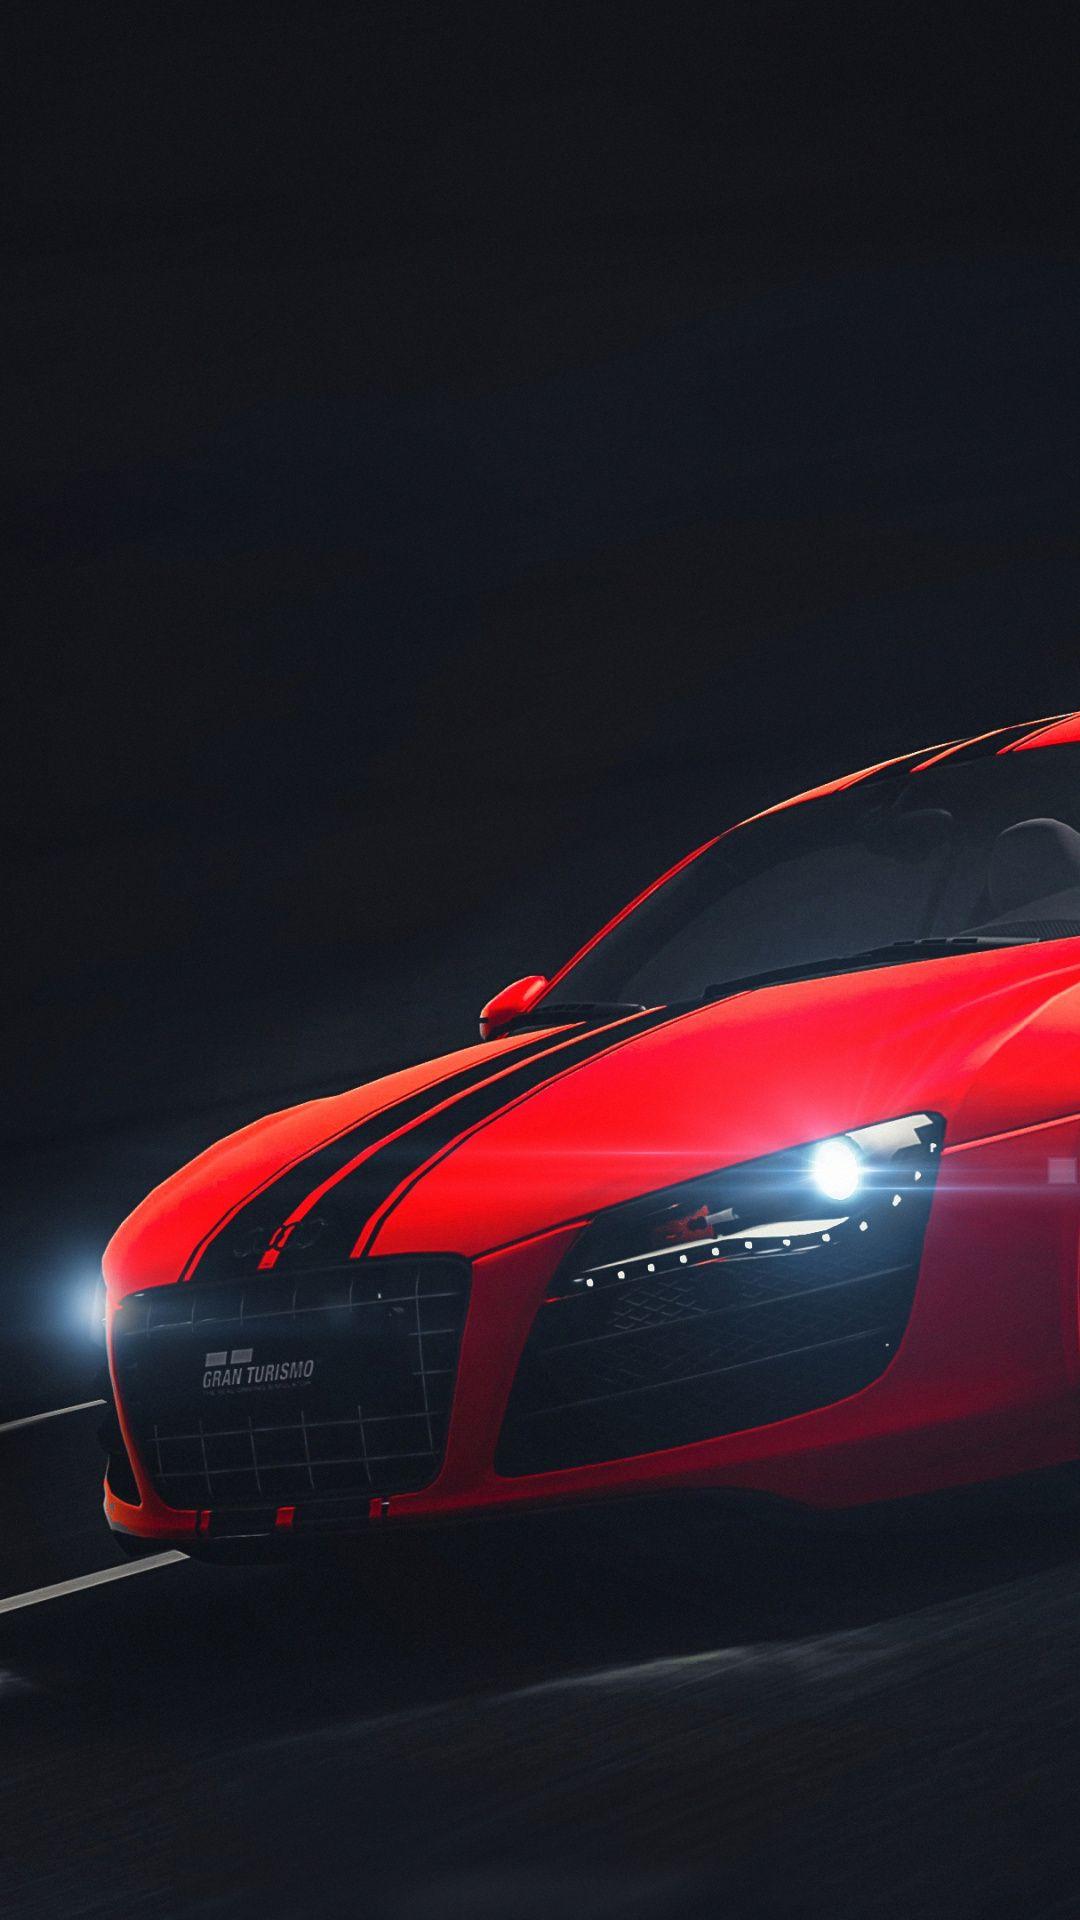 1080x1920 Red Audi R8 Type 42 Wallpaper Red Audi R8 Audi Audi R8